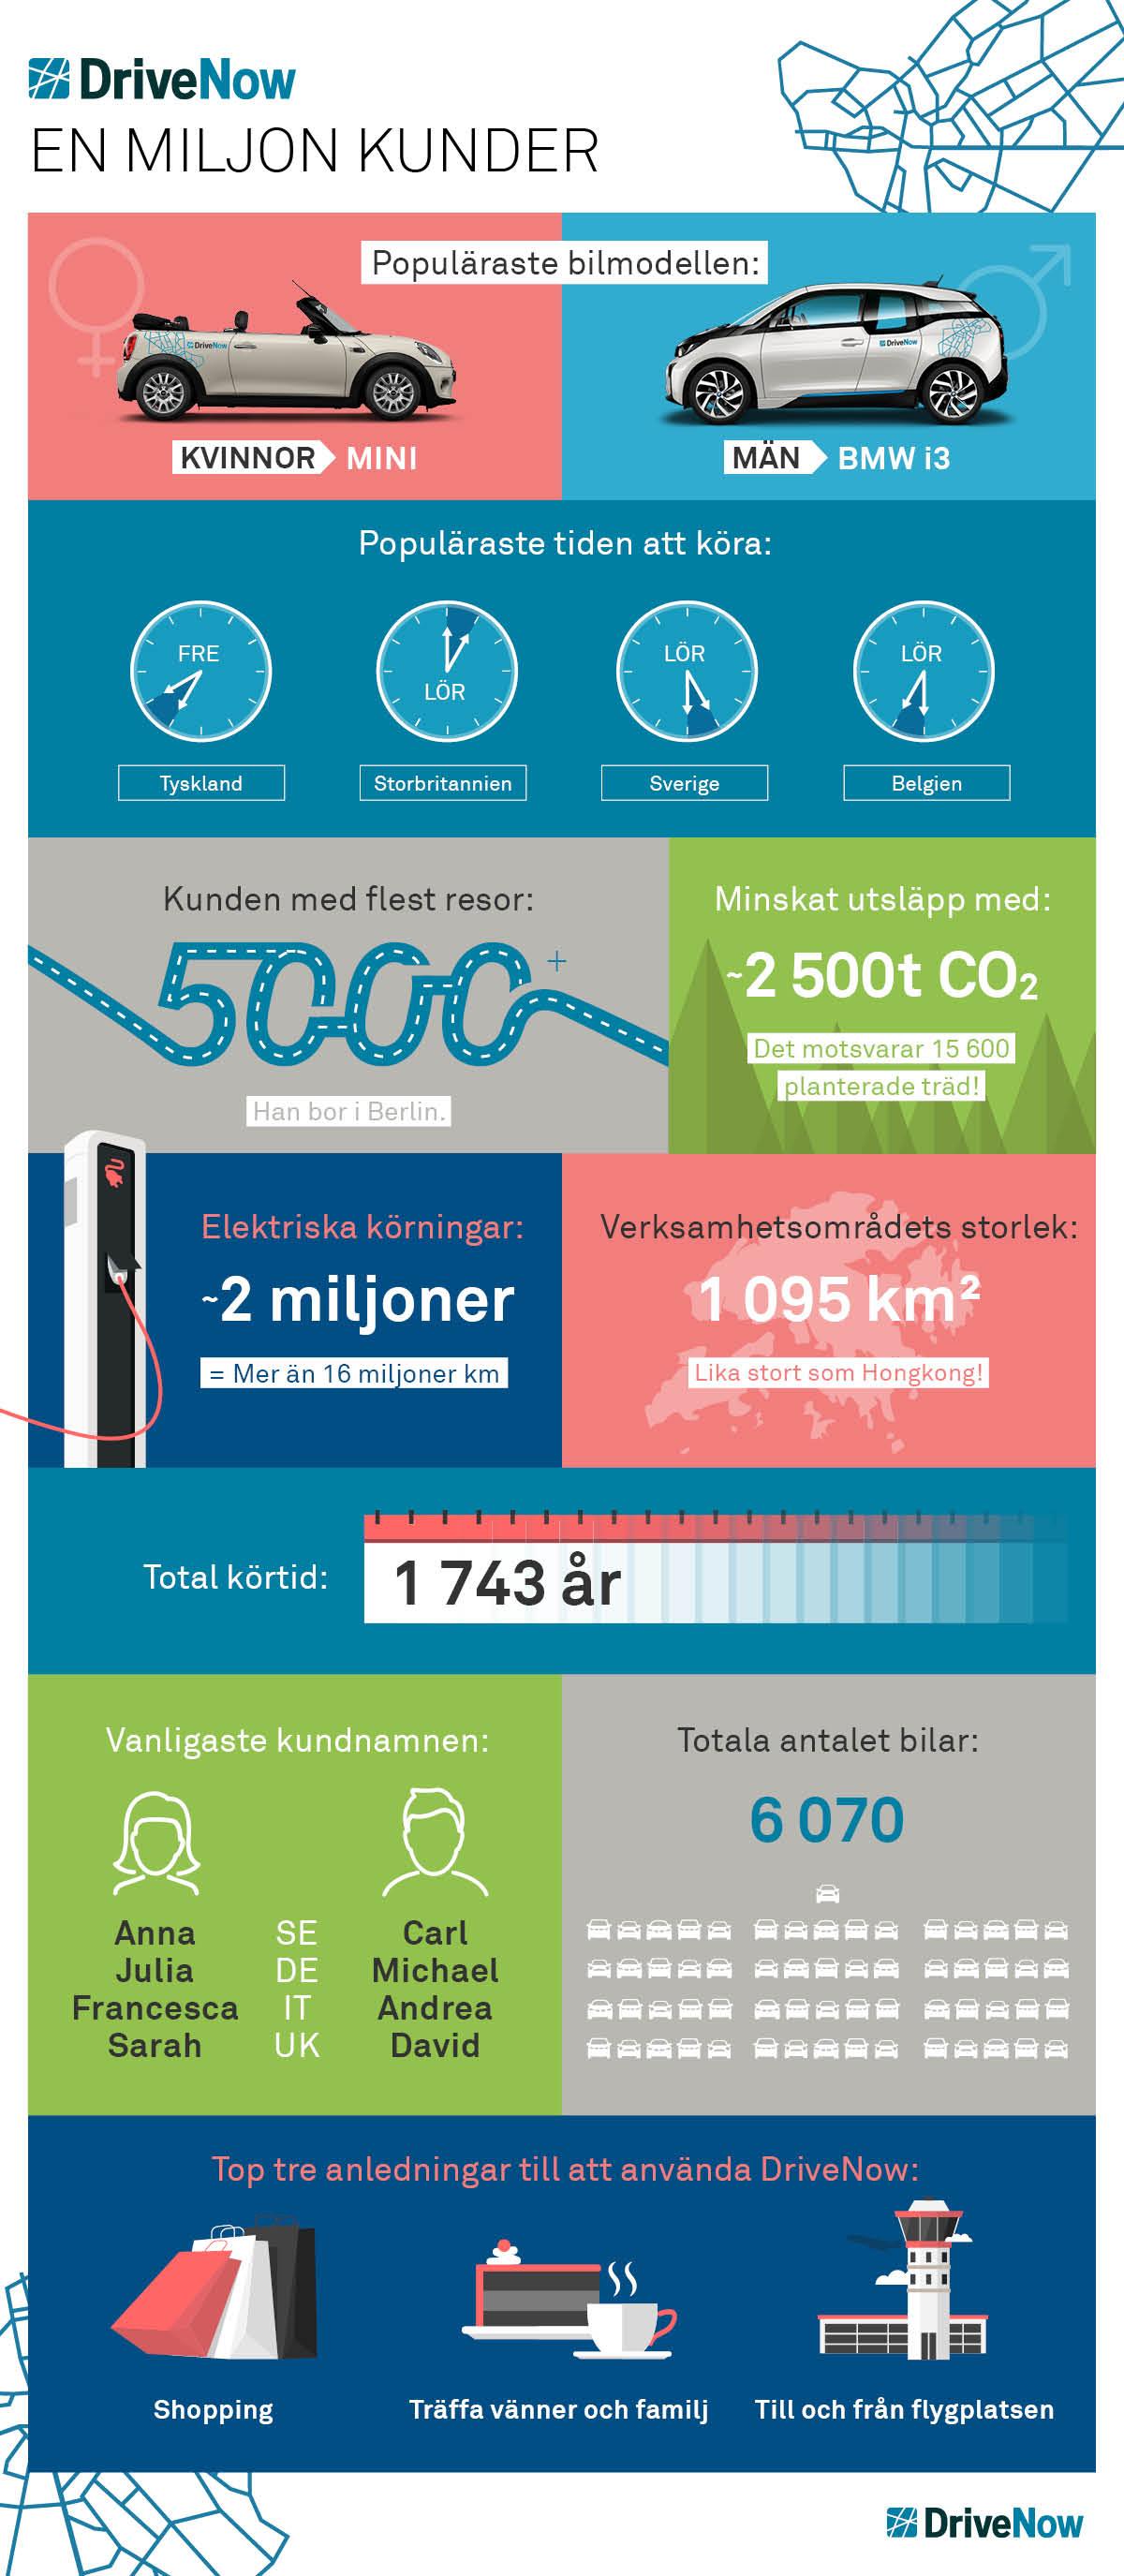 DriveNow Sverige Stockholm information